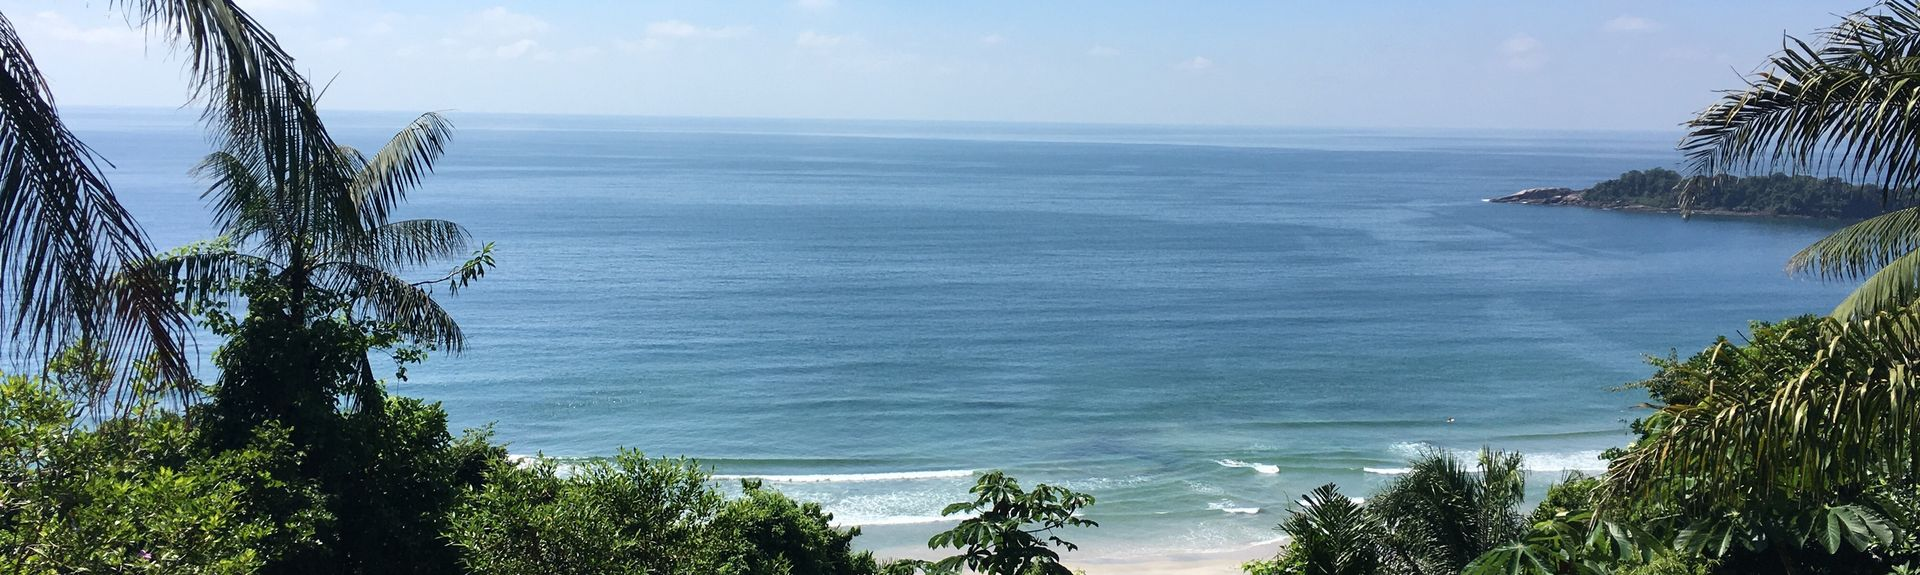 Praia da Enseada, Bertioga, São Paulo, Brazil